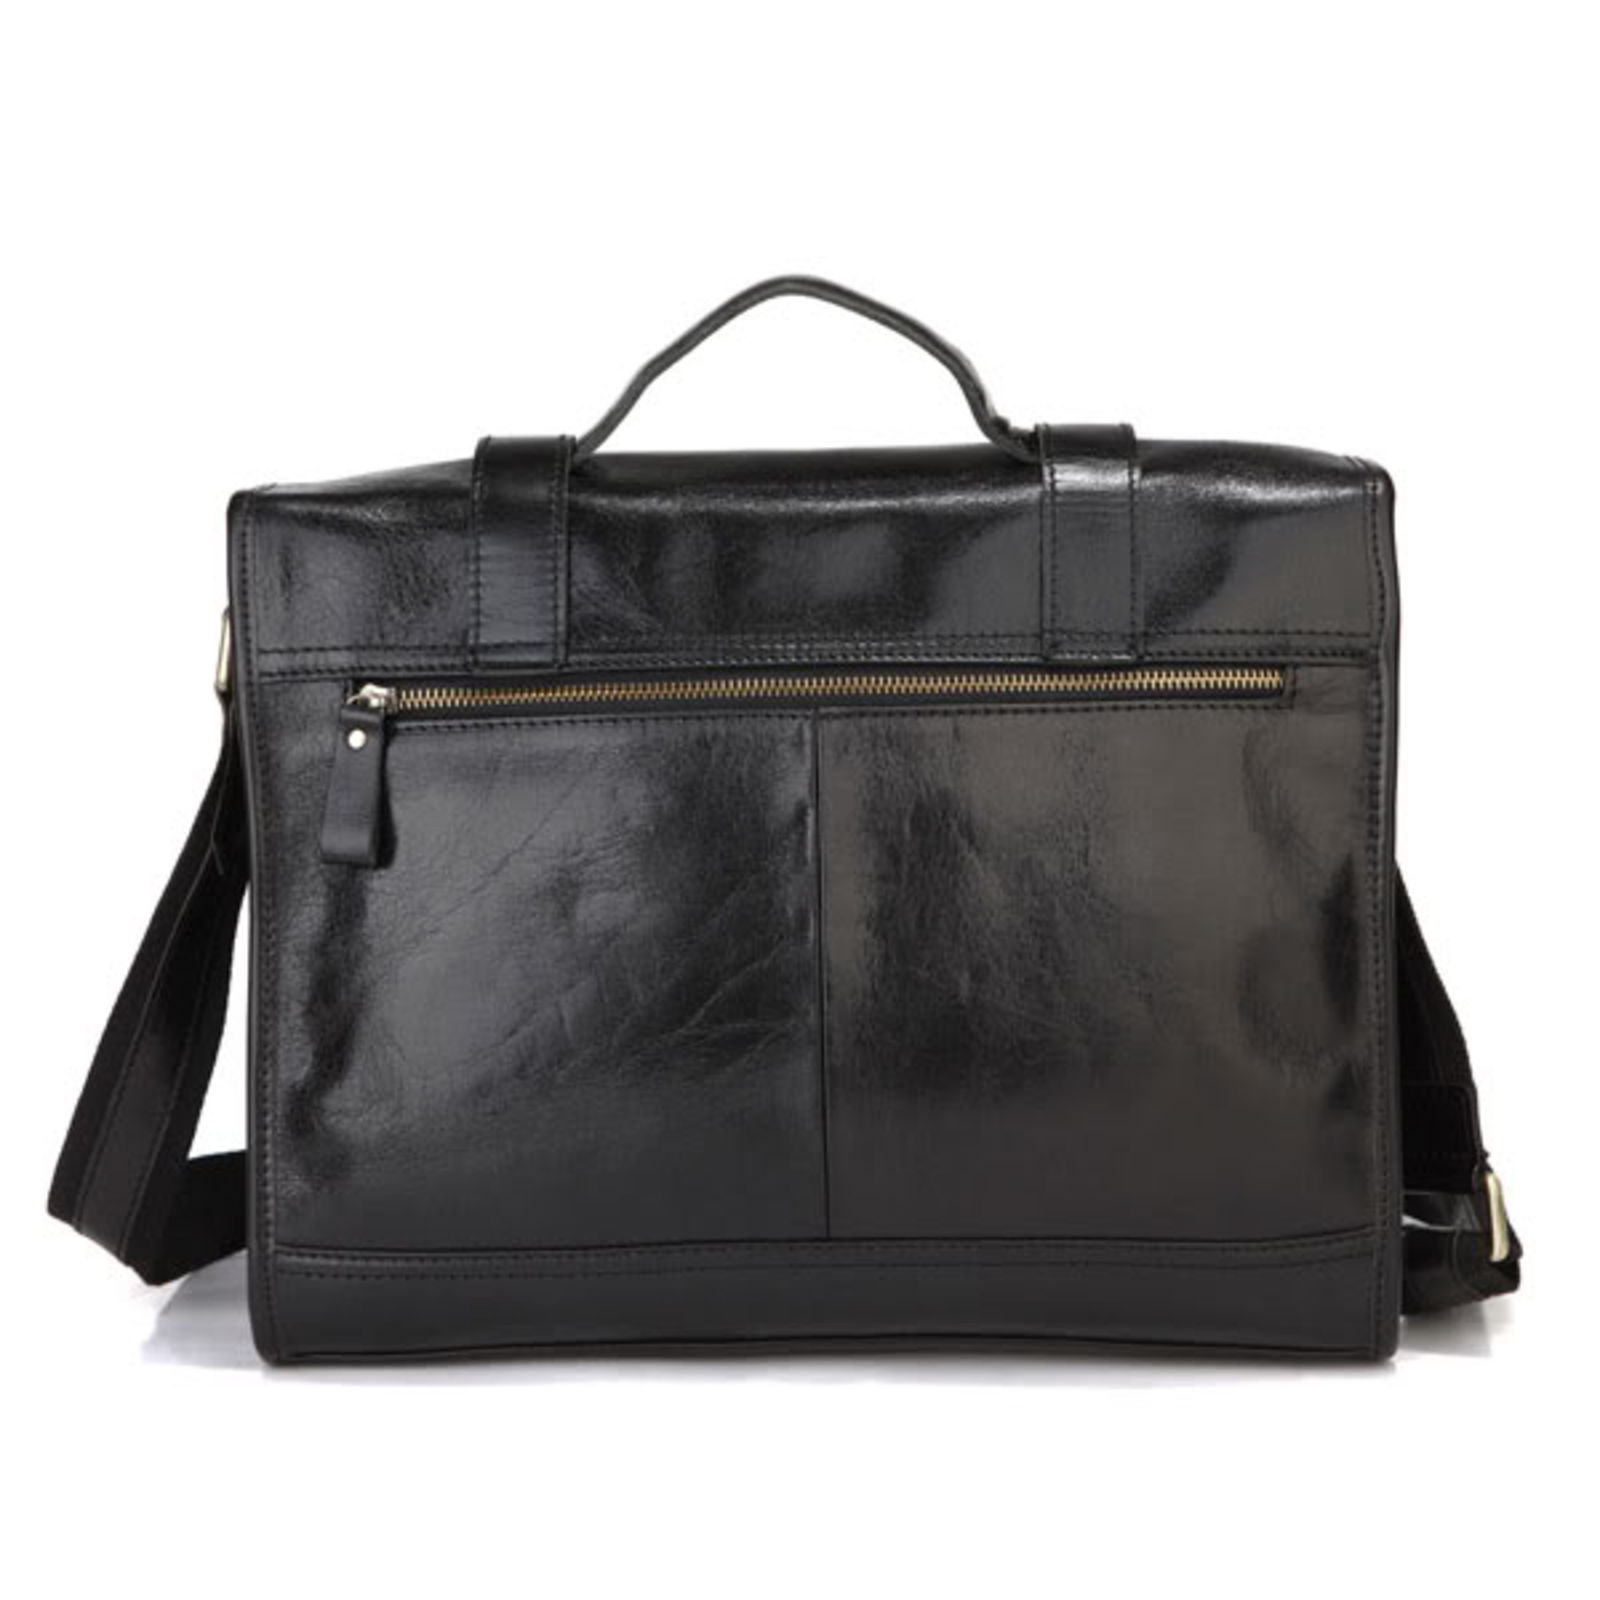 1ffefe01c9 Μαύρη Δερμάτινη Τσάντα Principal